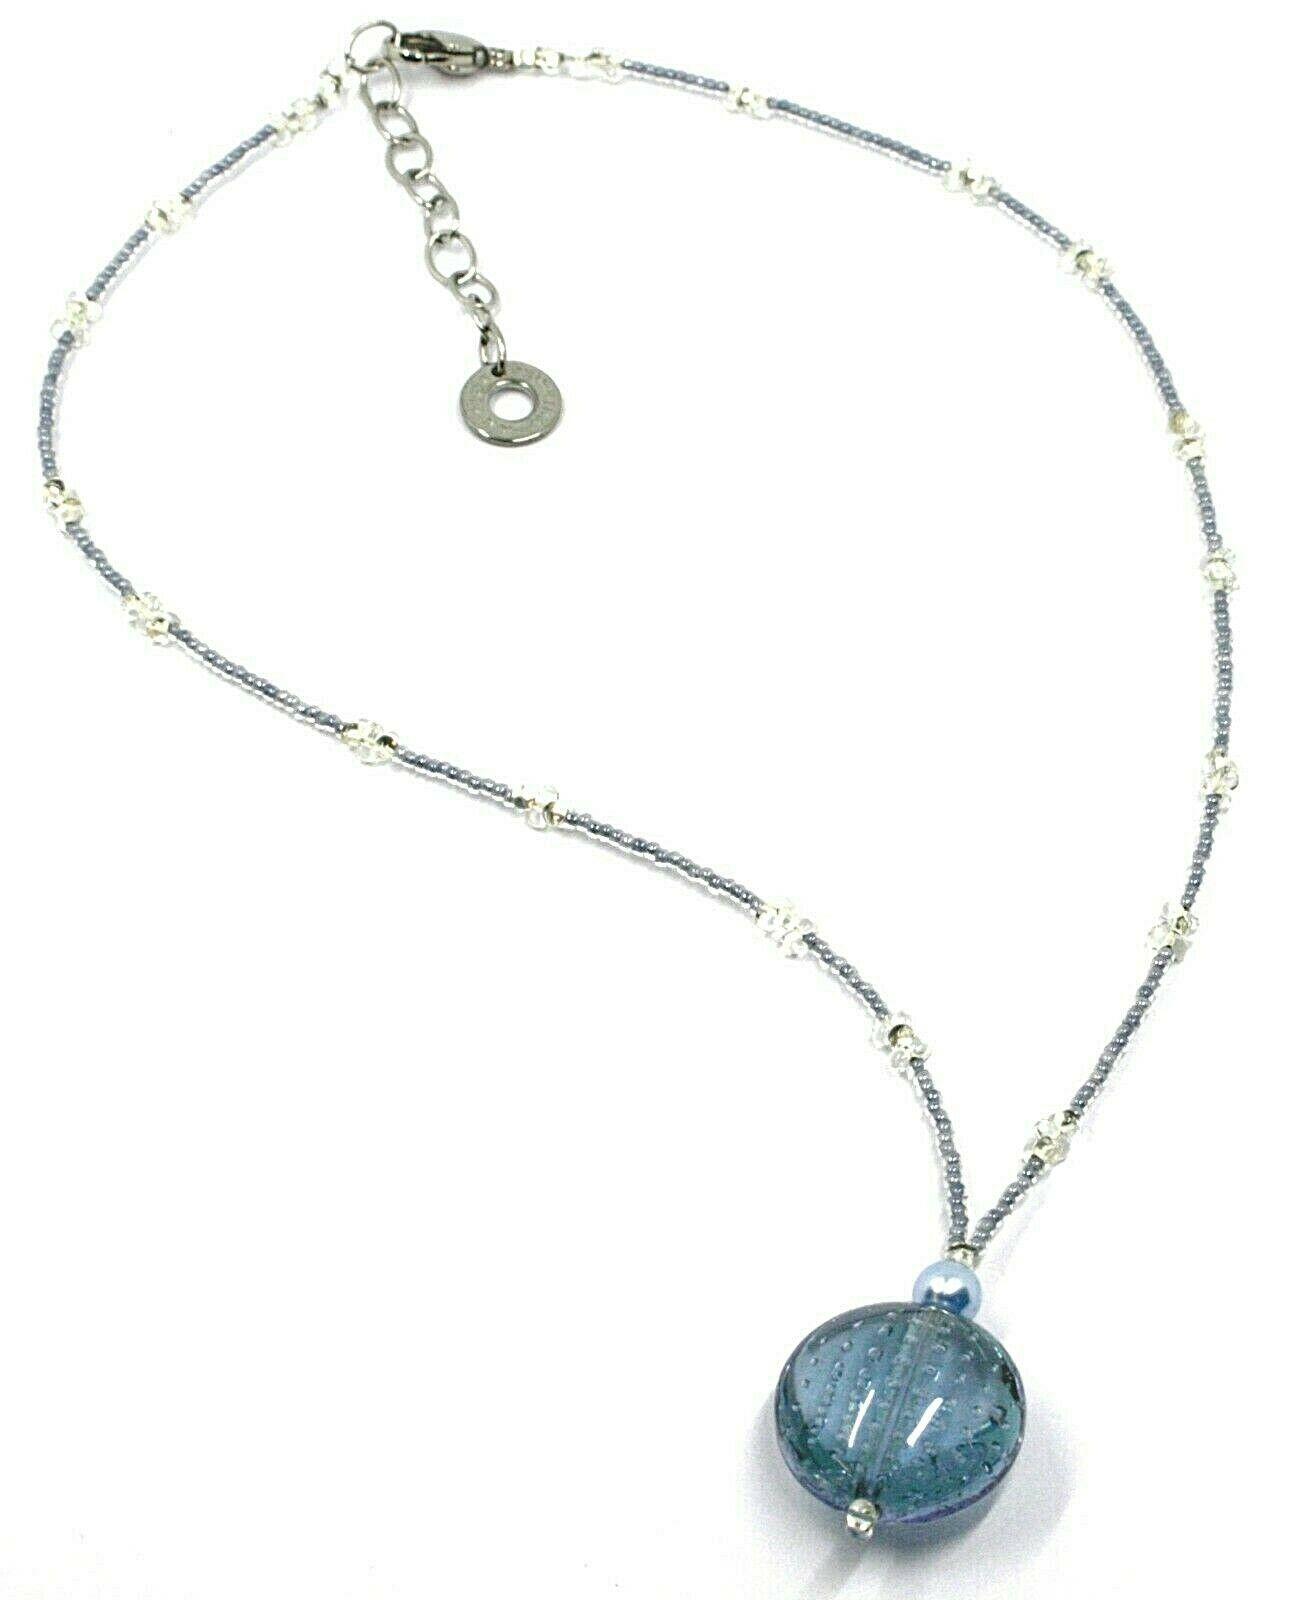 Halskette Antica Murrina Venezia, CO793A04, Disco Anhänger, Blau